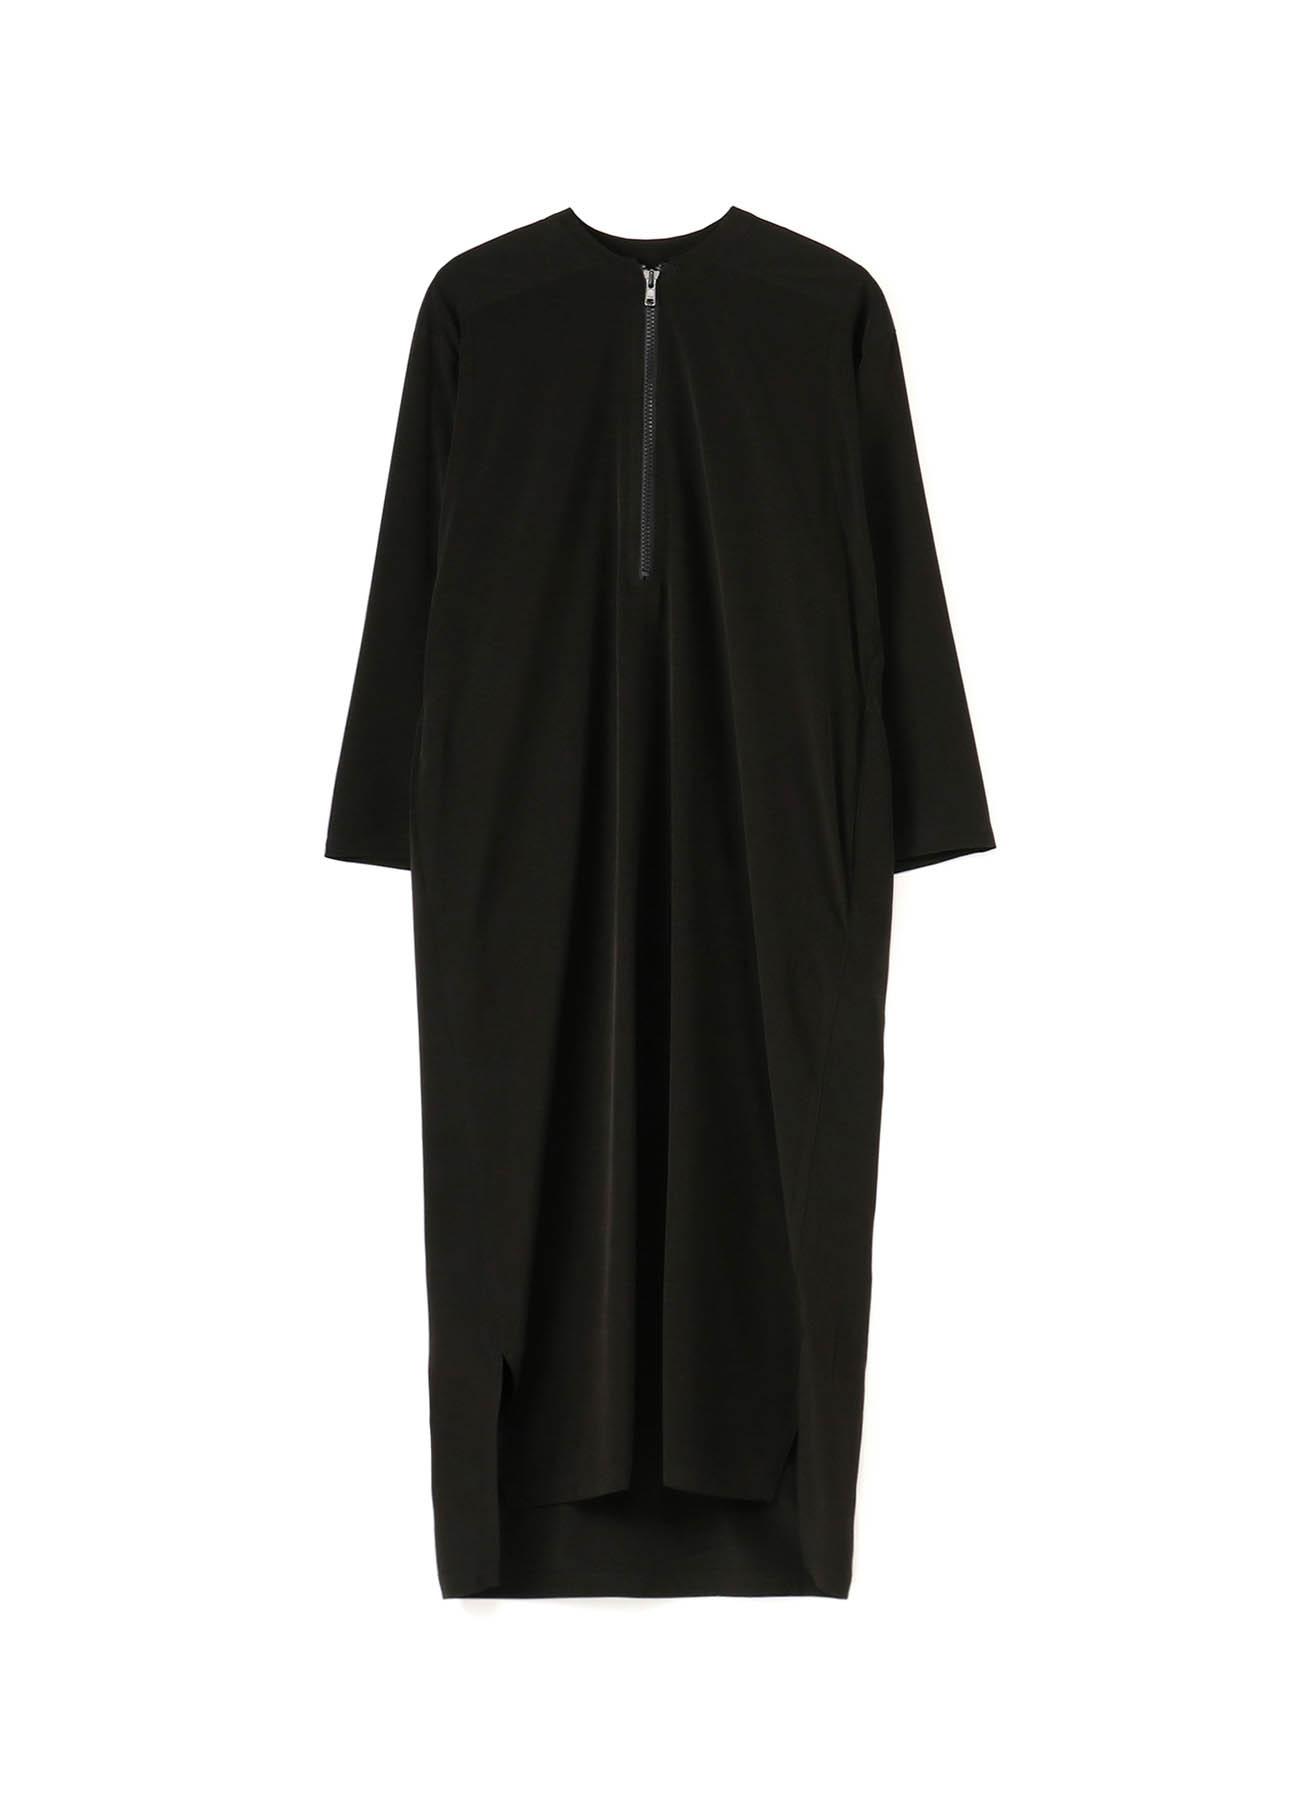 TRIACETATE POLY TUSSAR FASTENER DRESS